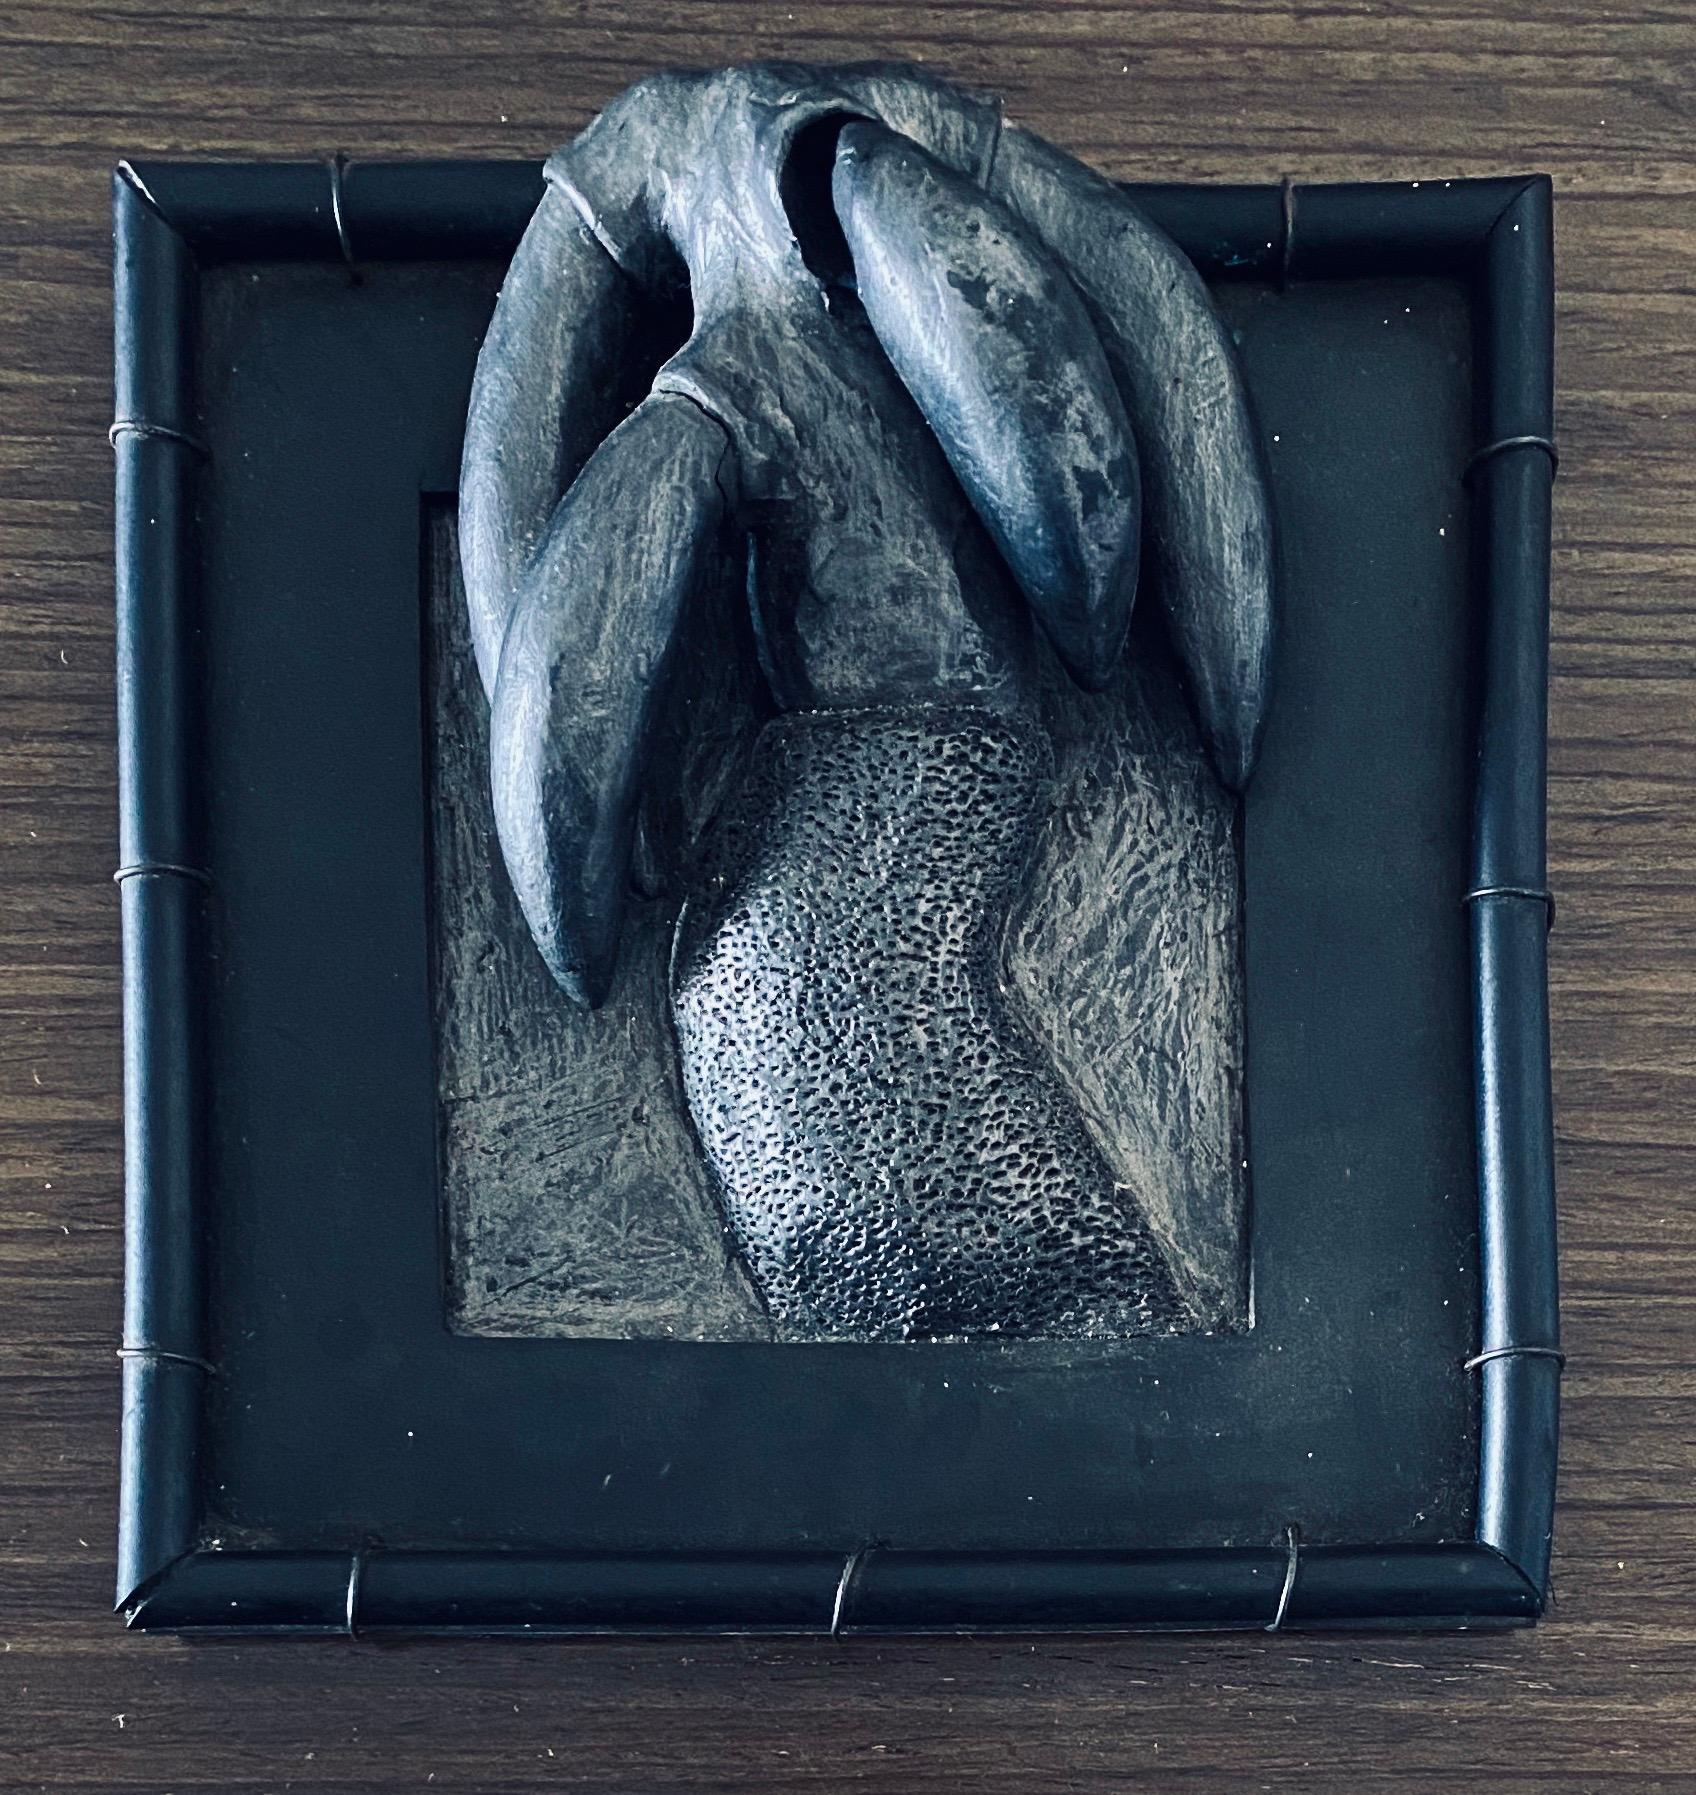 Abstract Mixed Media Biomorphism Wall Sculpture. Miami Artist Carol K Brown